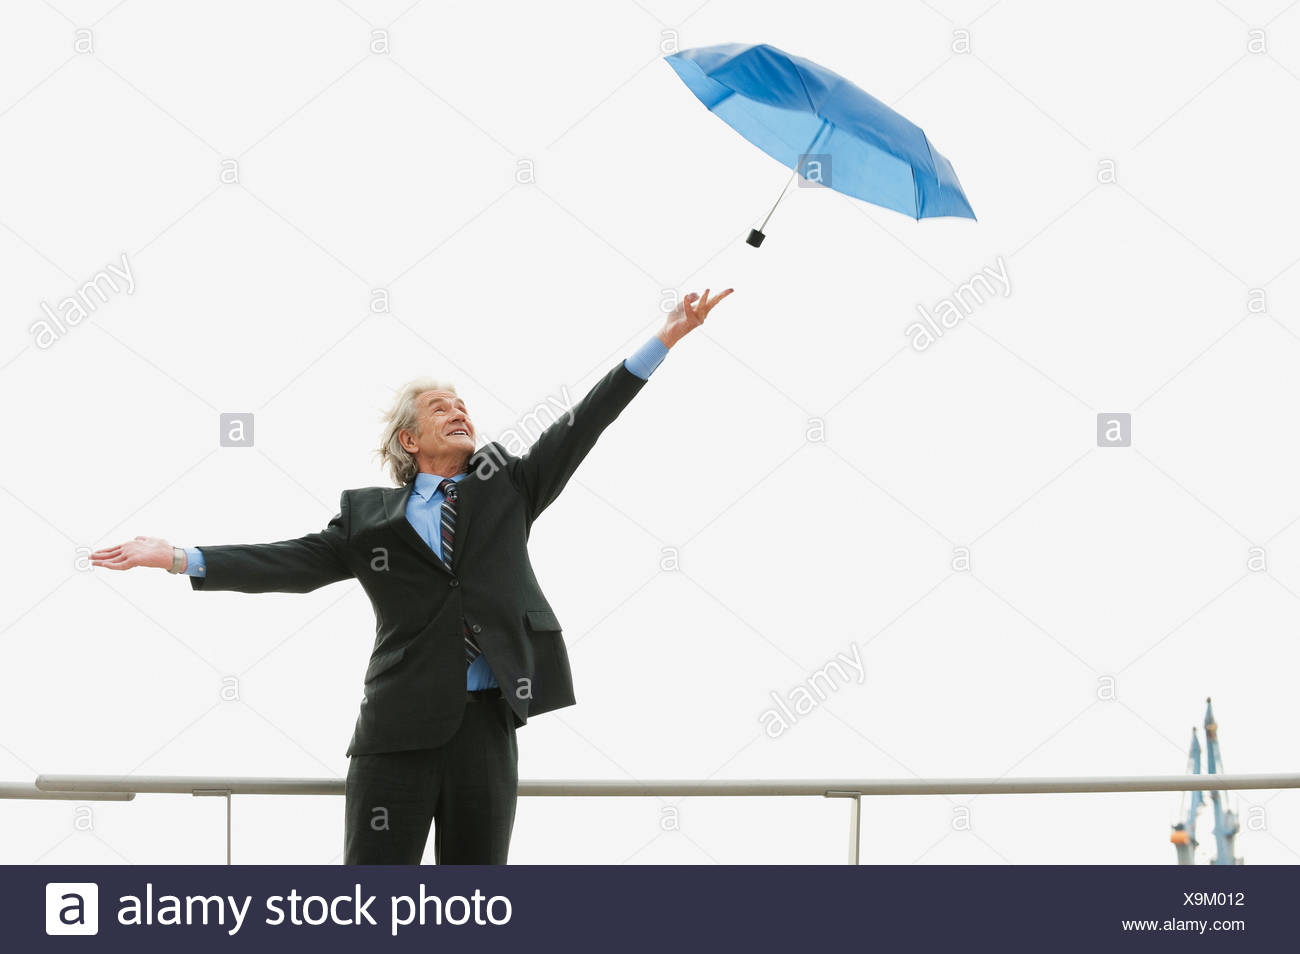 Germany, Hamburg, Businessman trying to catch fly-away umbrella - Stock Image